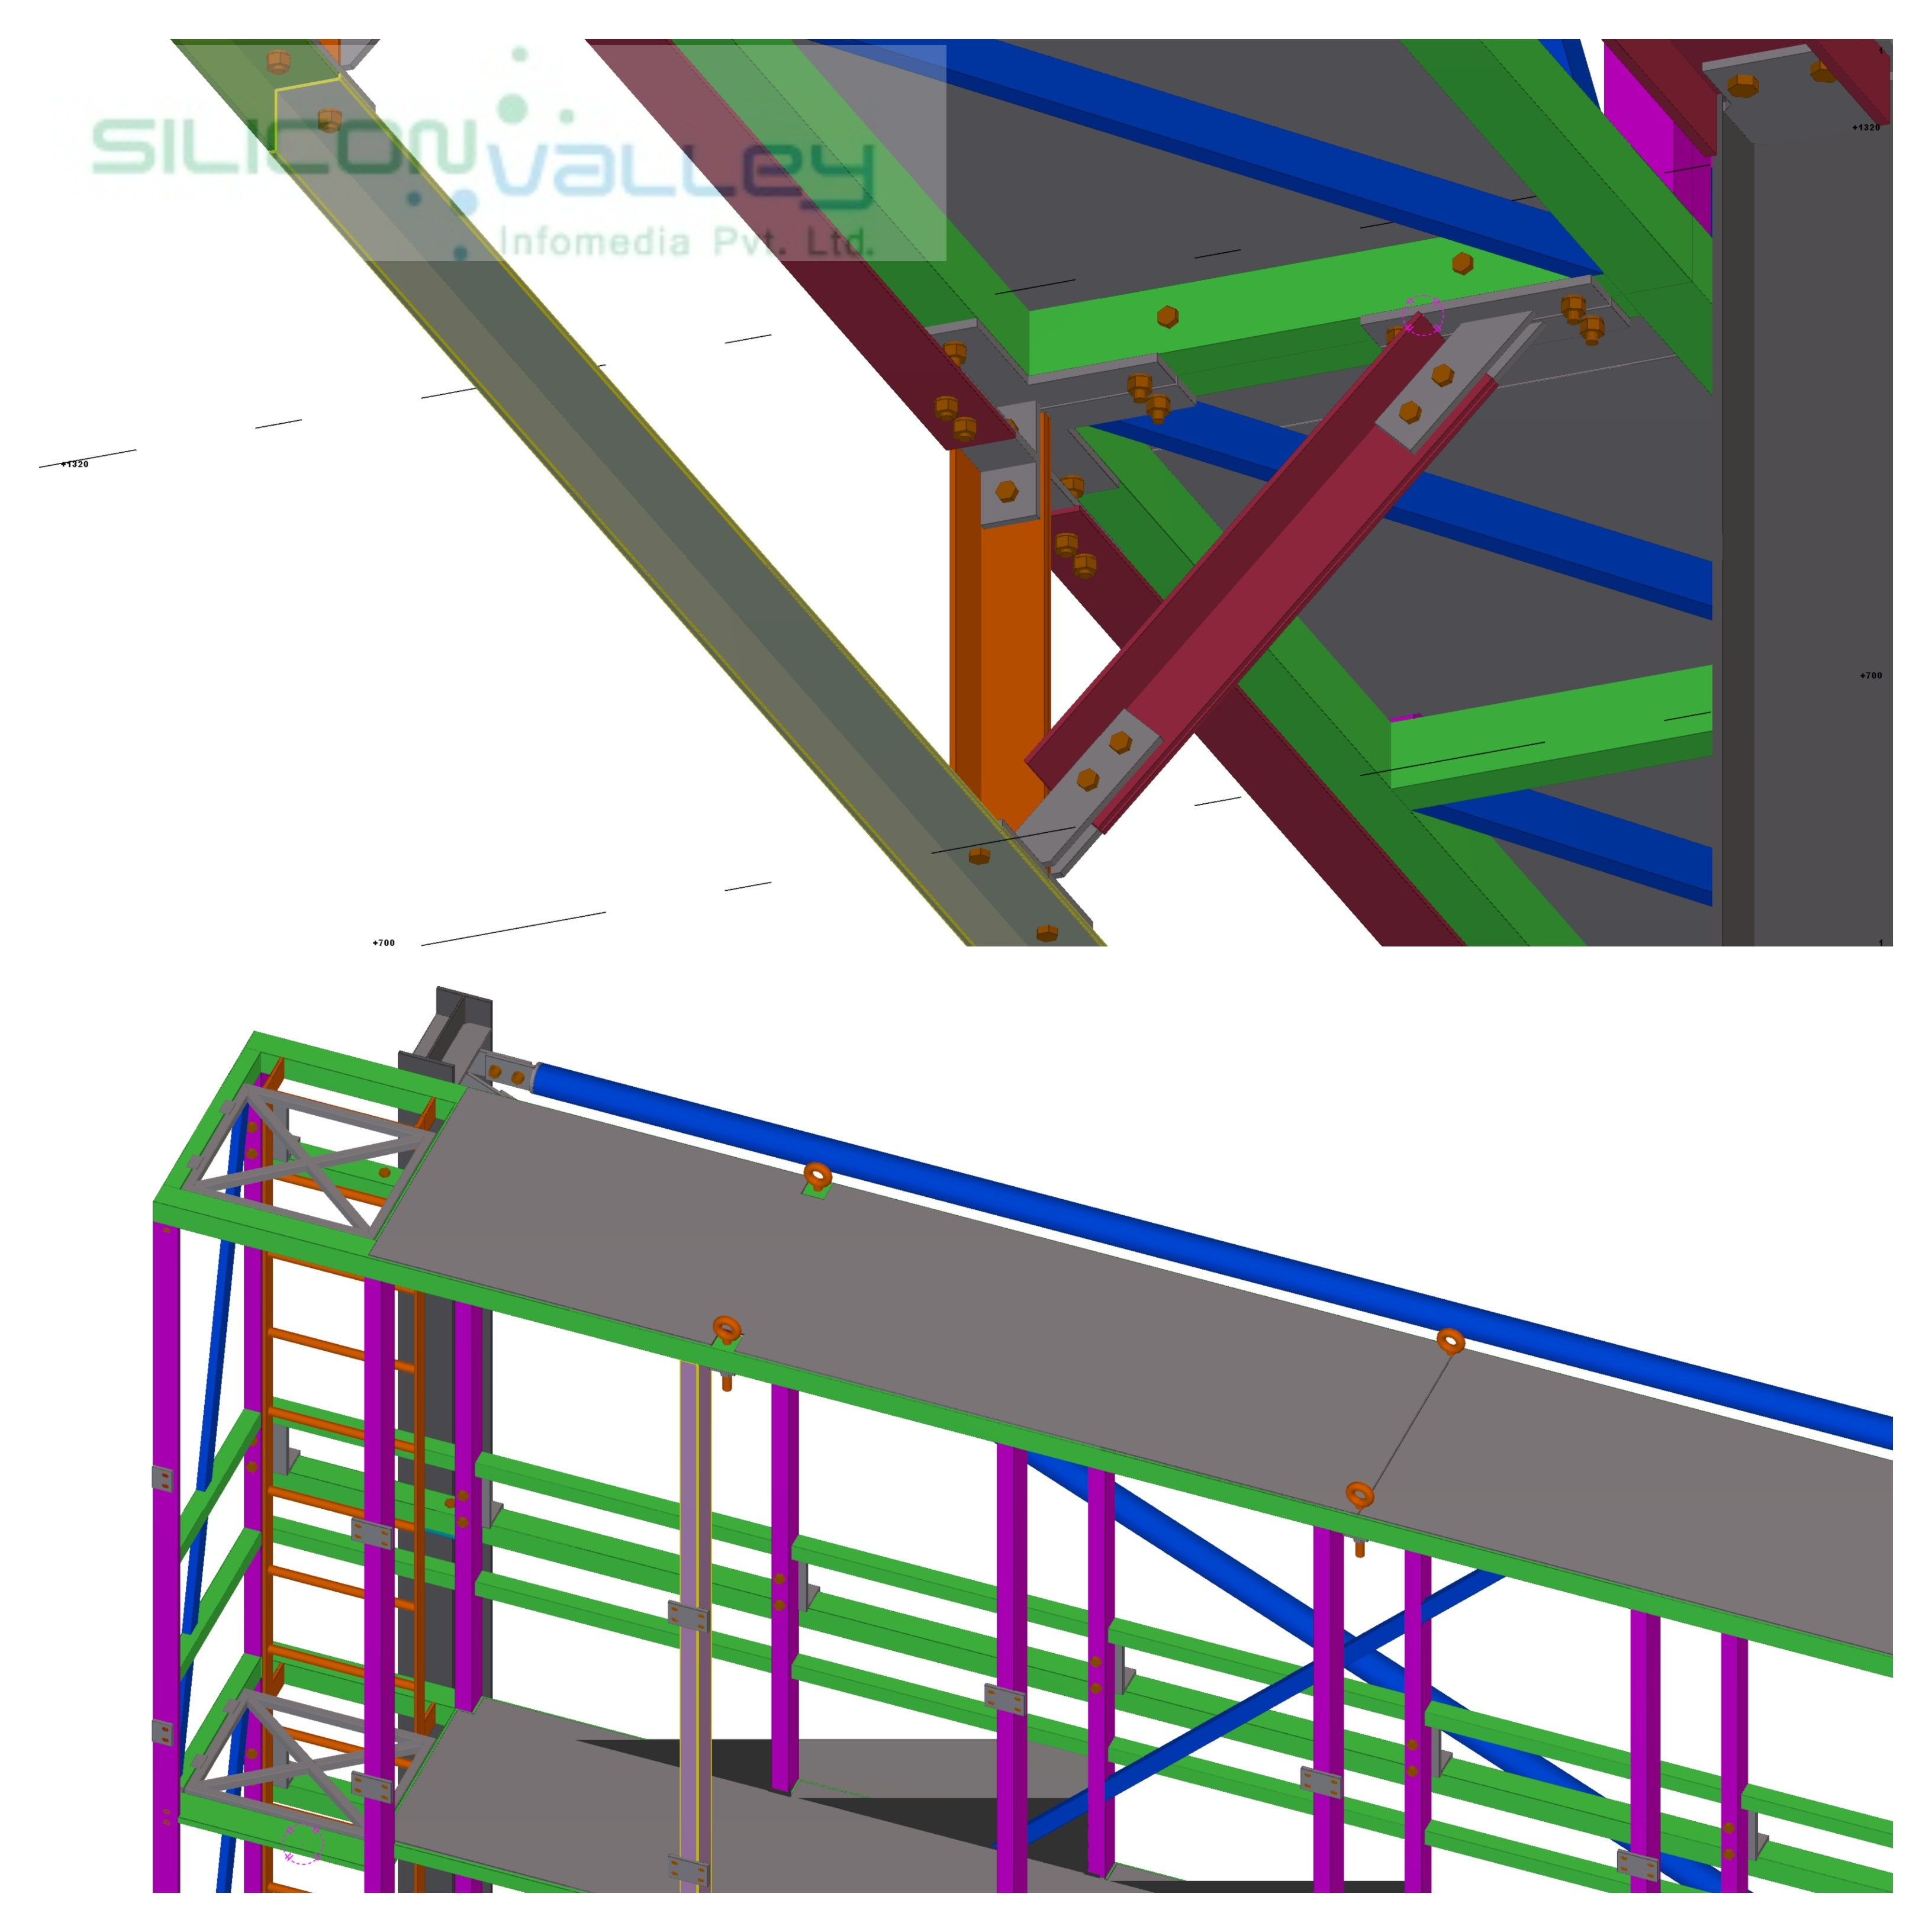 Sheet Metal Fabrication Drawings & Design